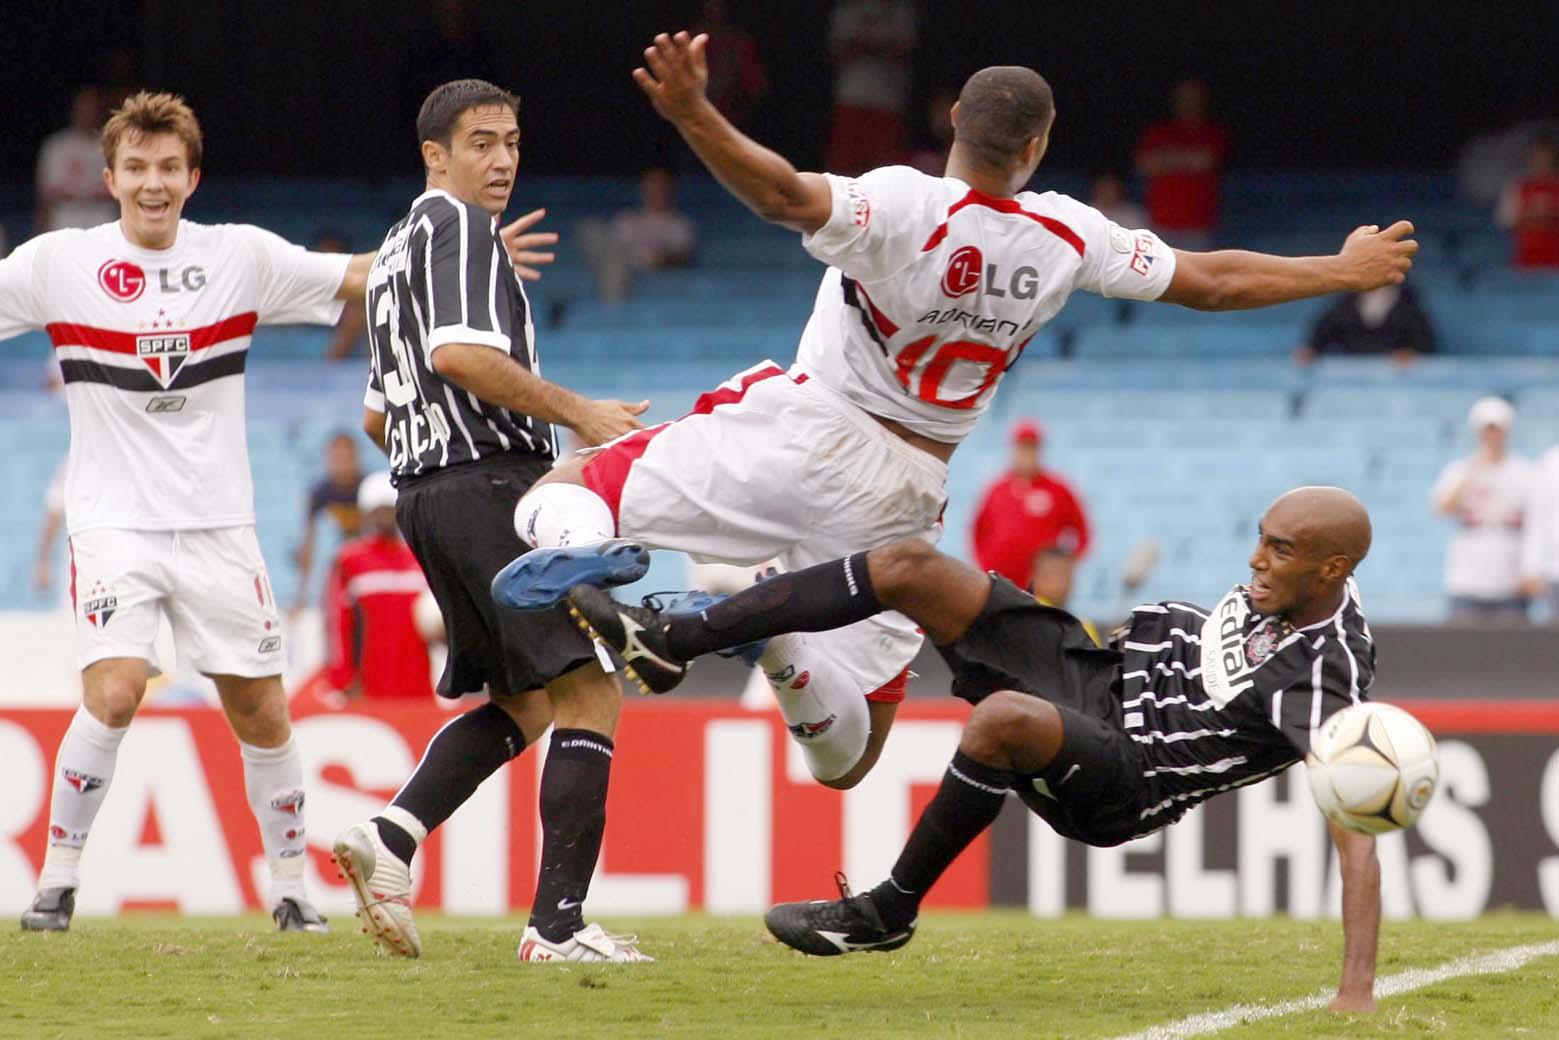 História - Corinthians x São Paulo 2221be5ecf929